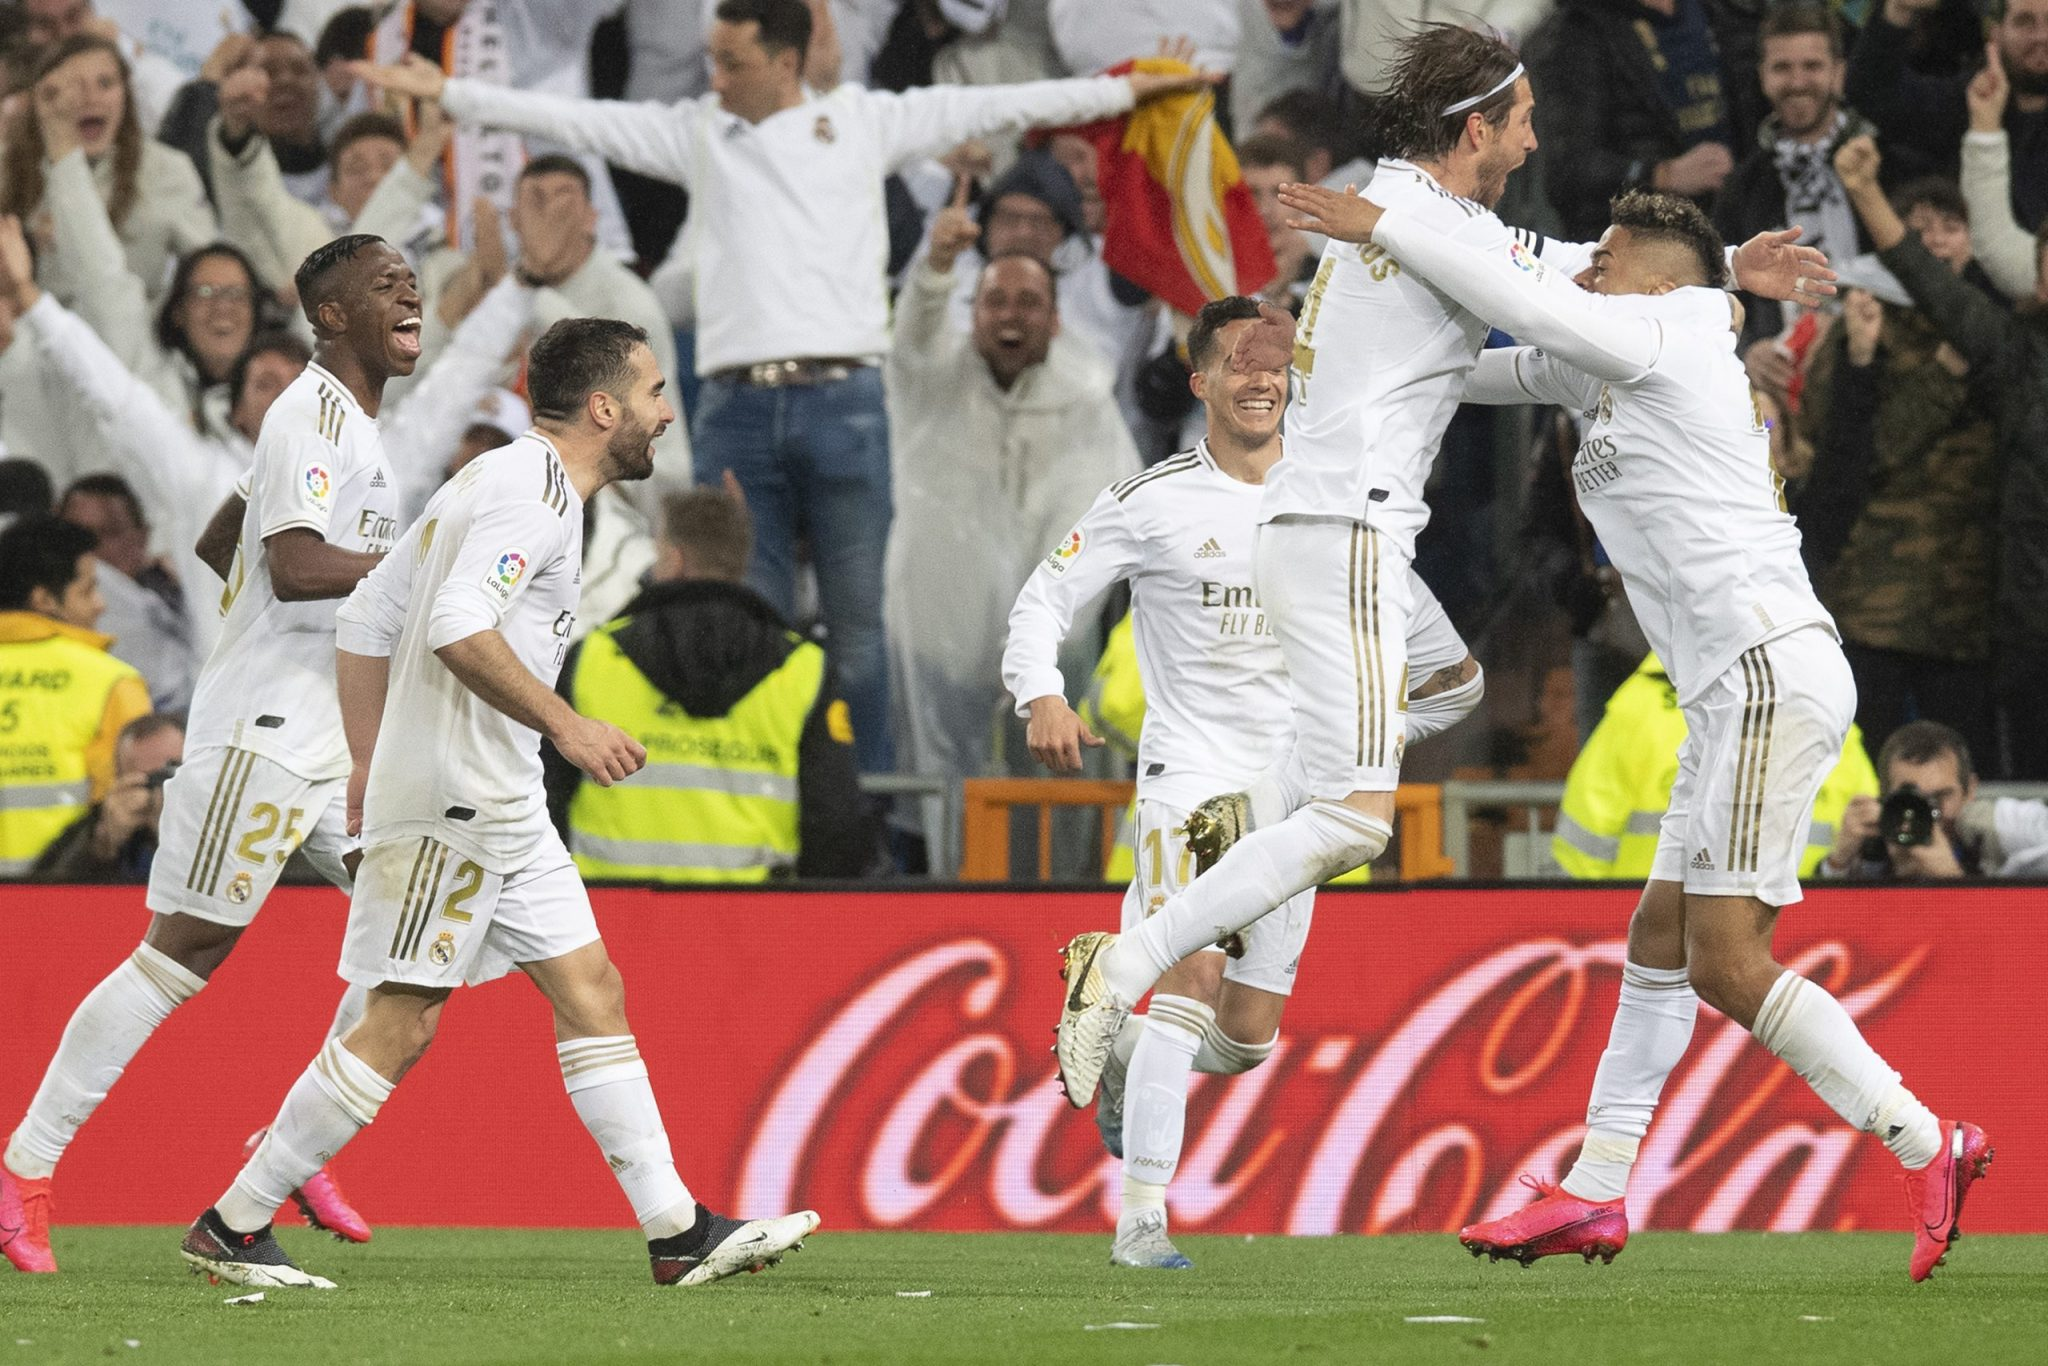 Real Madrid's El Clasico win (February 2020)